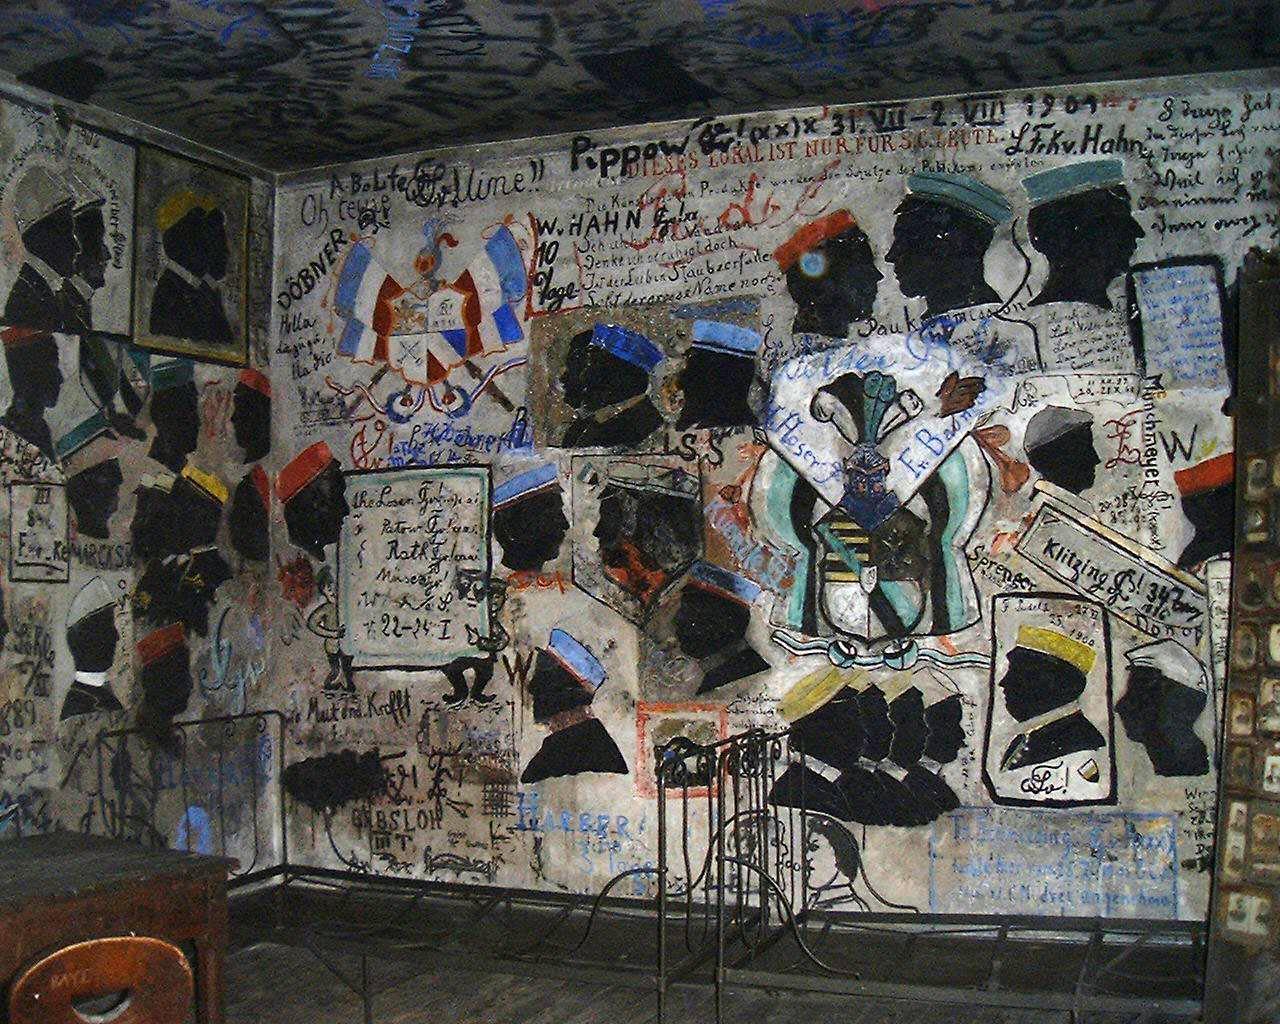 Student Graffiti in the Studentekarzer